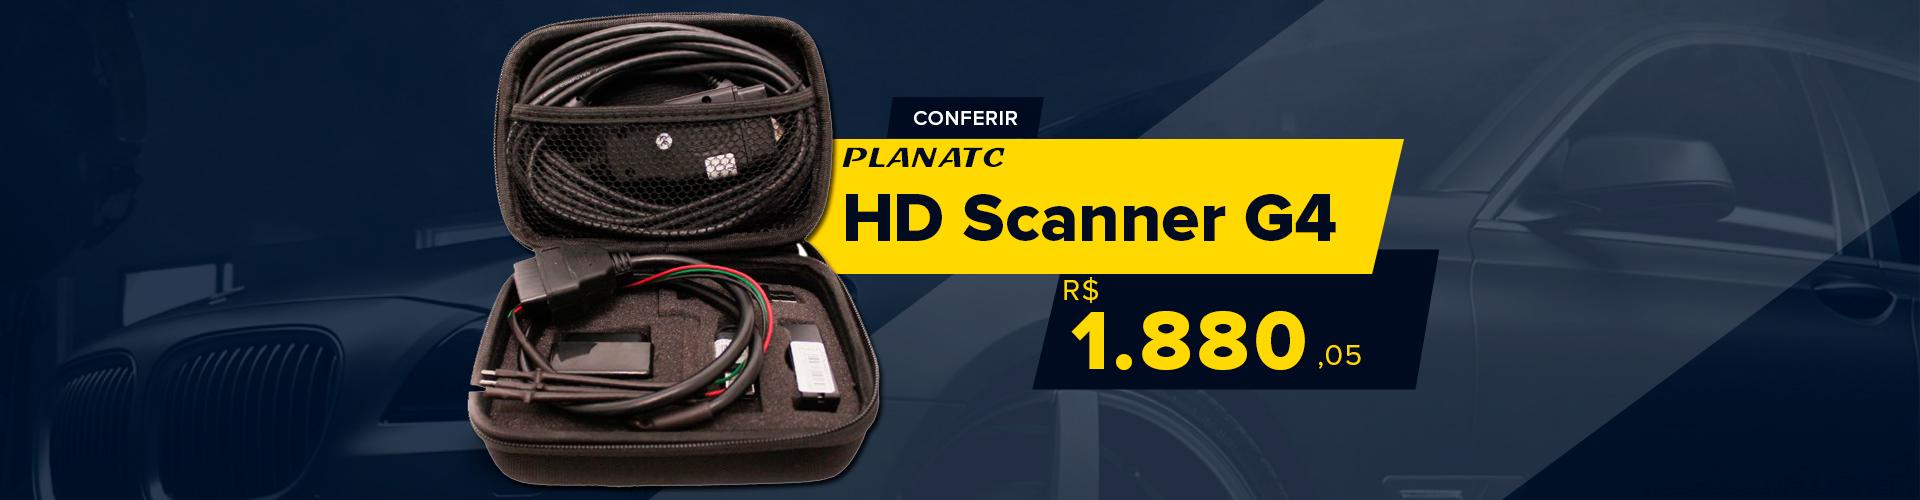 HD Scanner G4